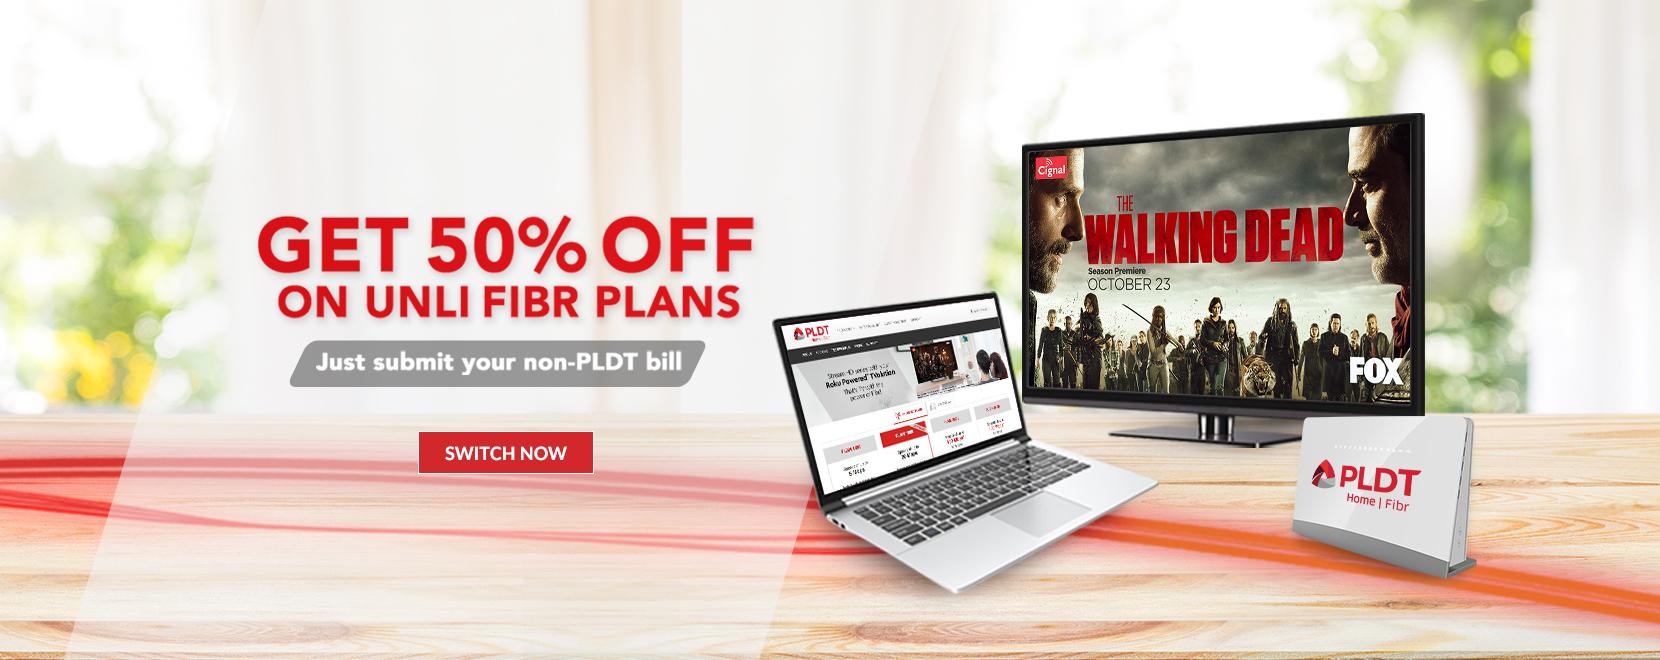 Pldt Home Broadband Plan 499 Smart Lark Design Blog